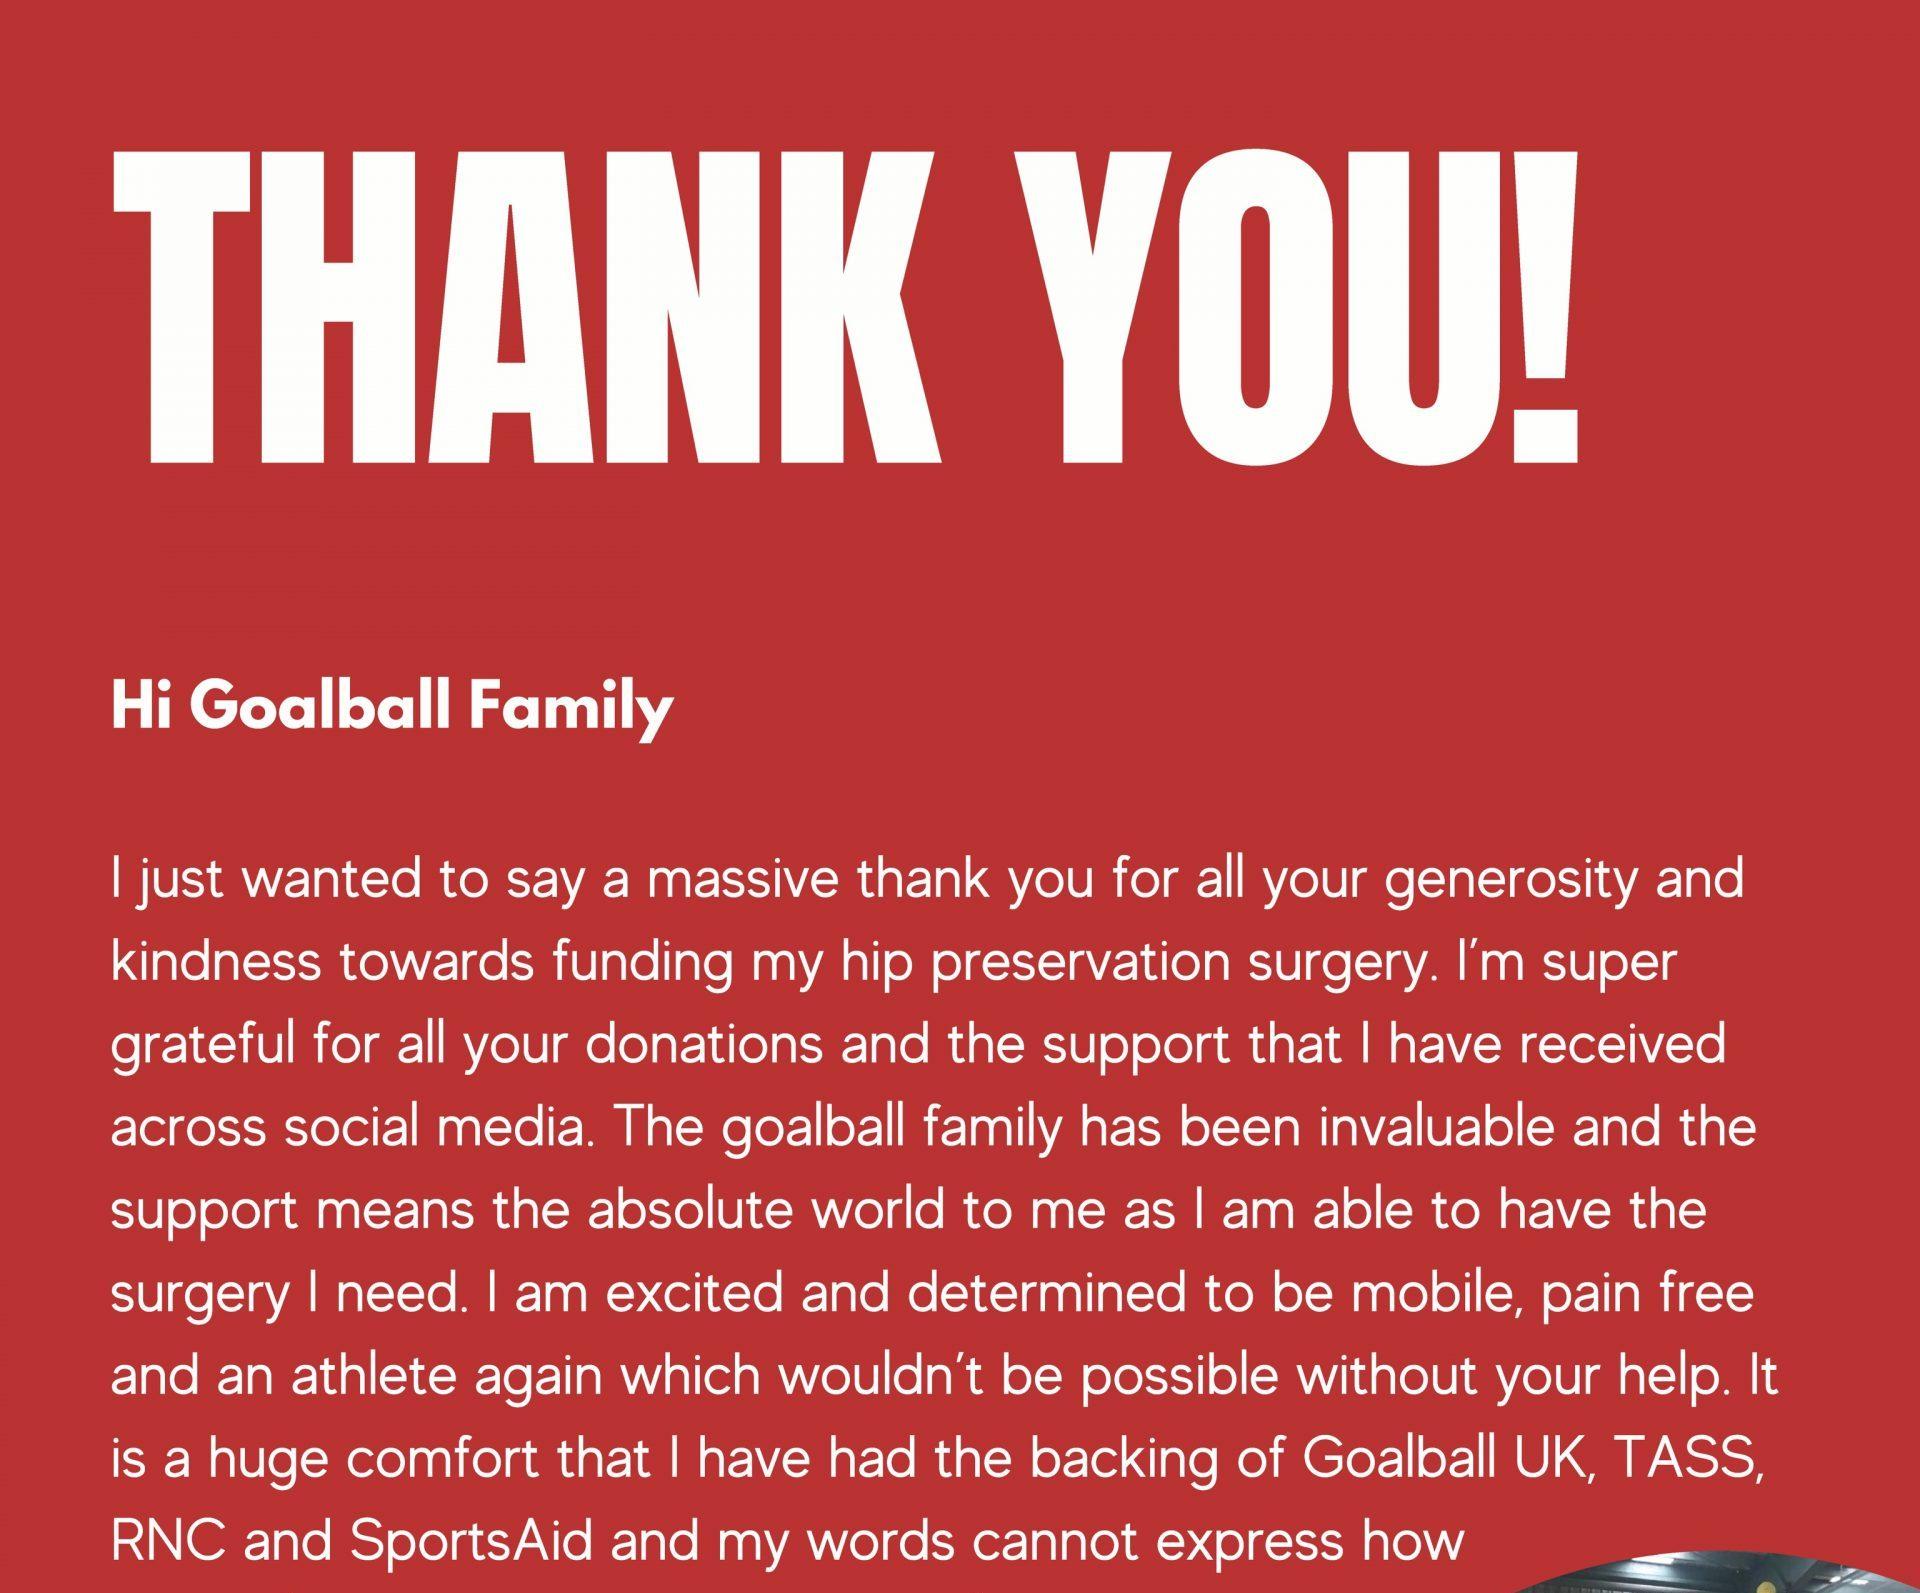 Megan Smithson-Booth open letter thanking the #GoalballFamily.